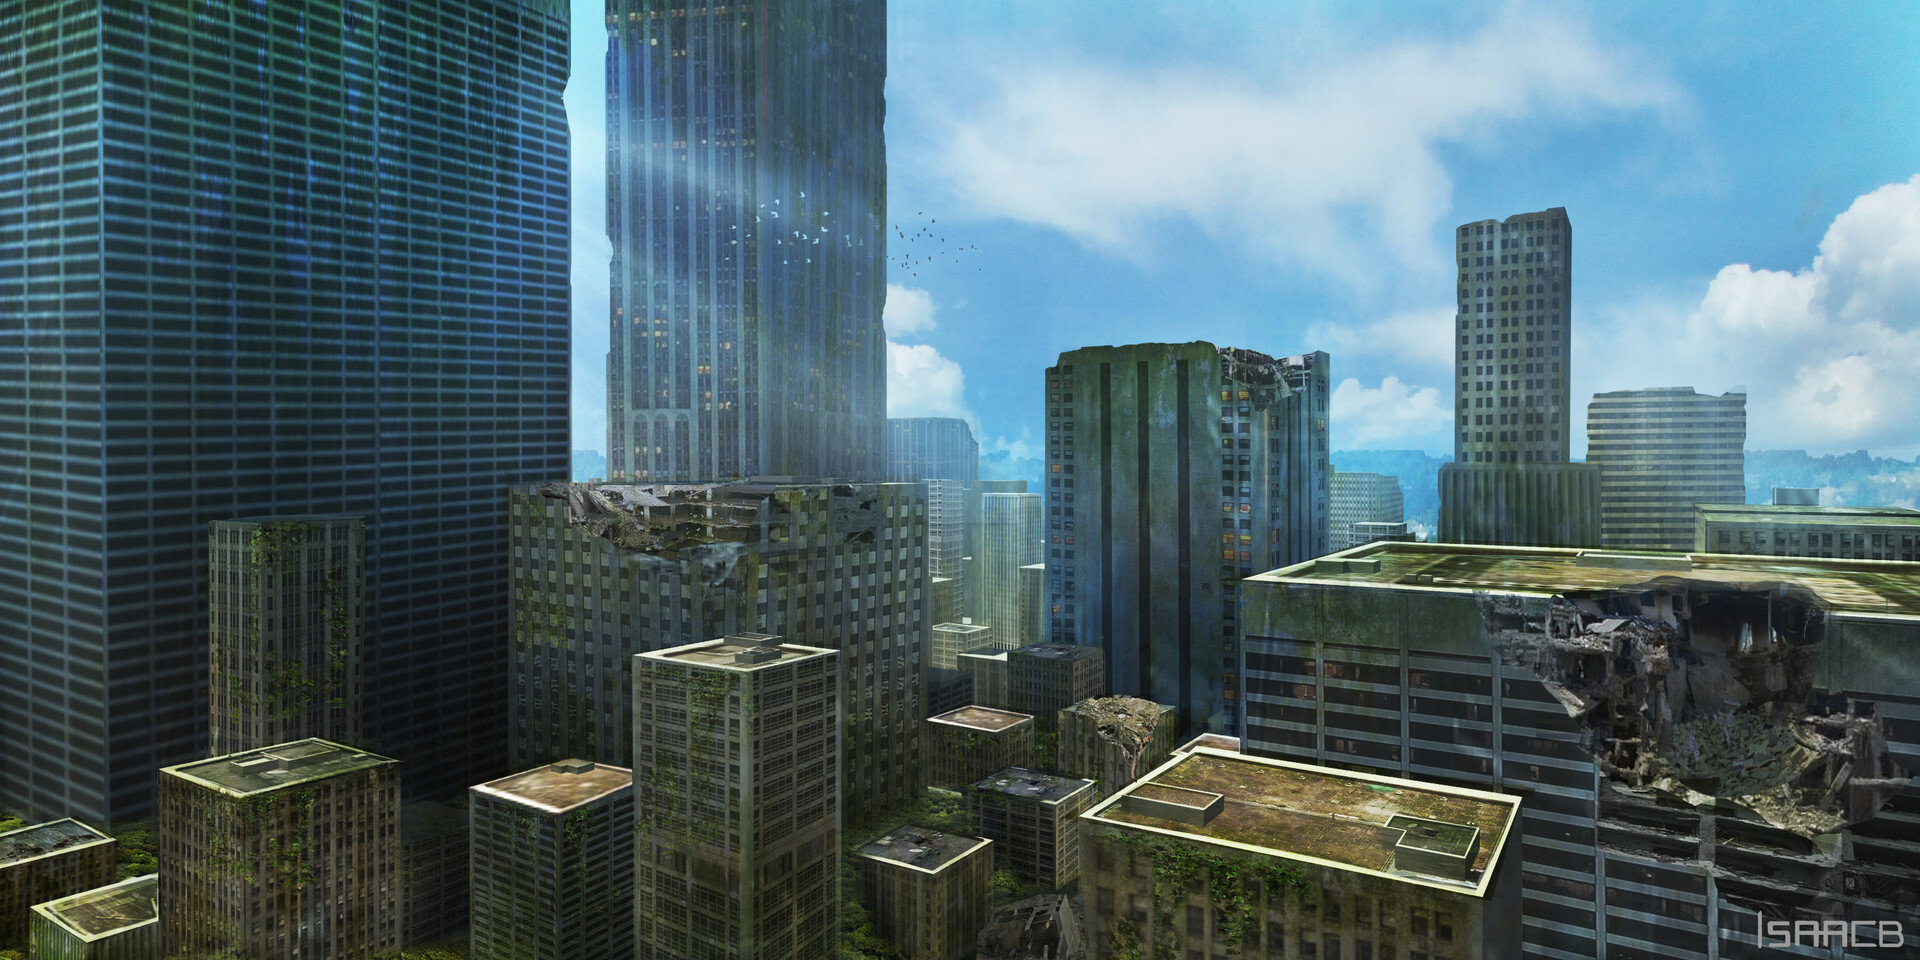 isaac-barrett-building-render-concept-07-contrast.jpg